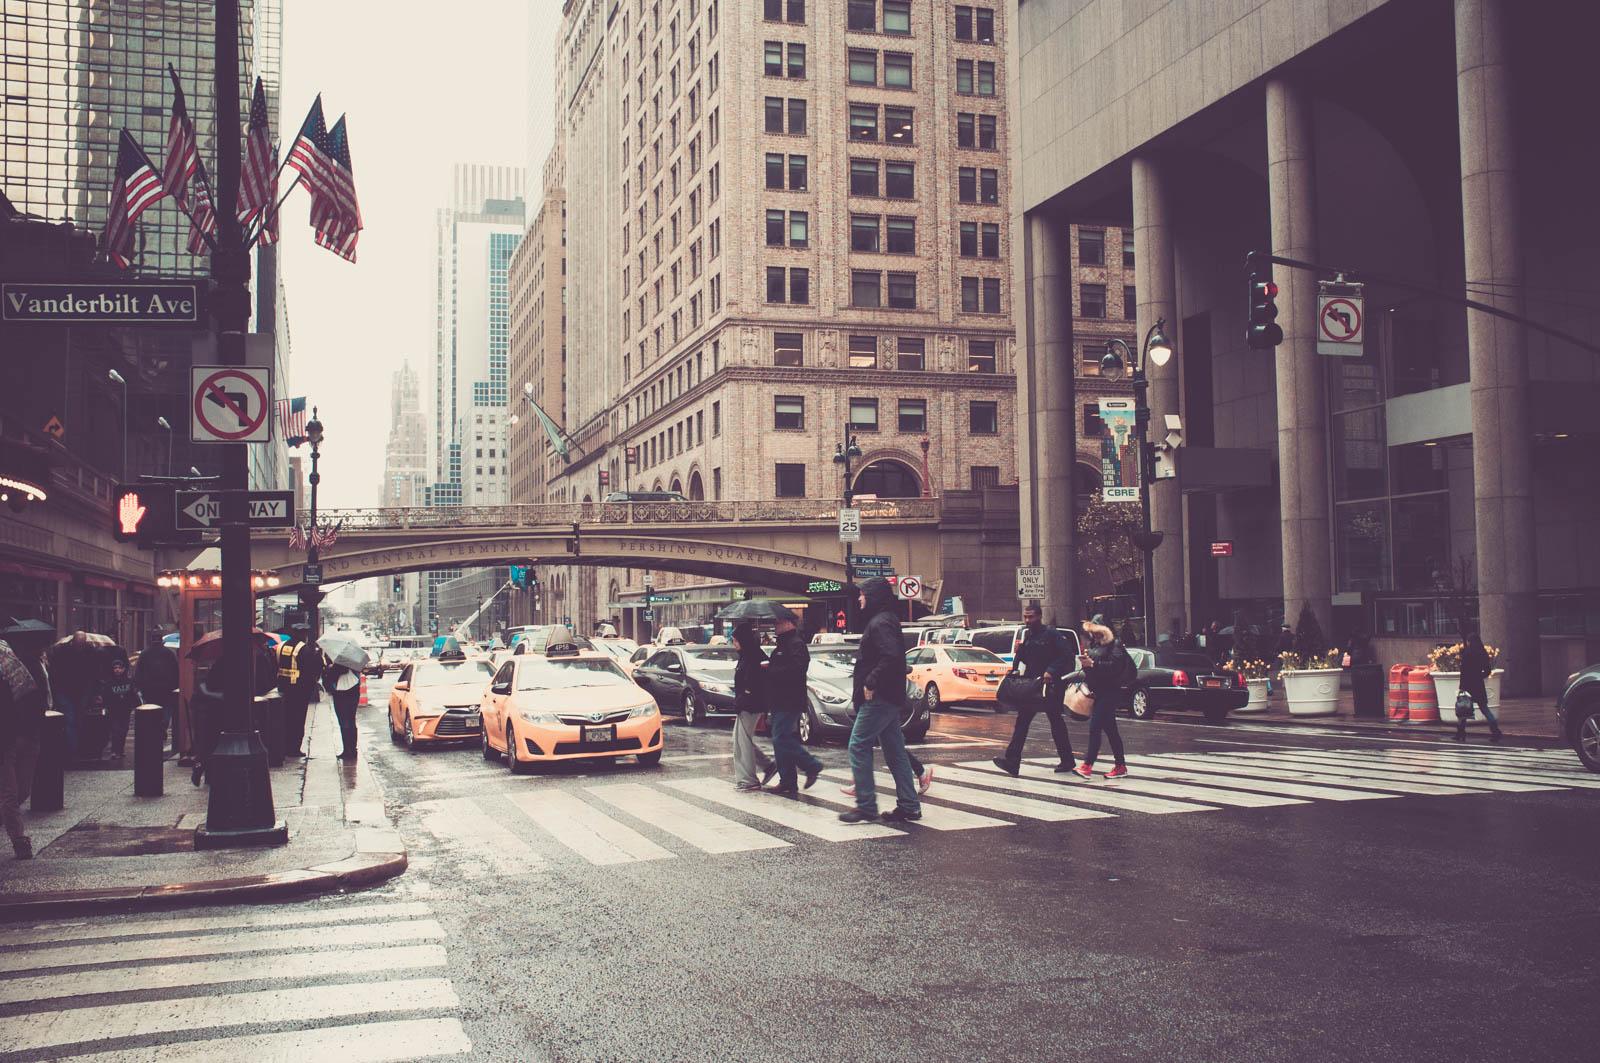 Zebra Crossing at 42nd Street & Vanderbilt Avenue